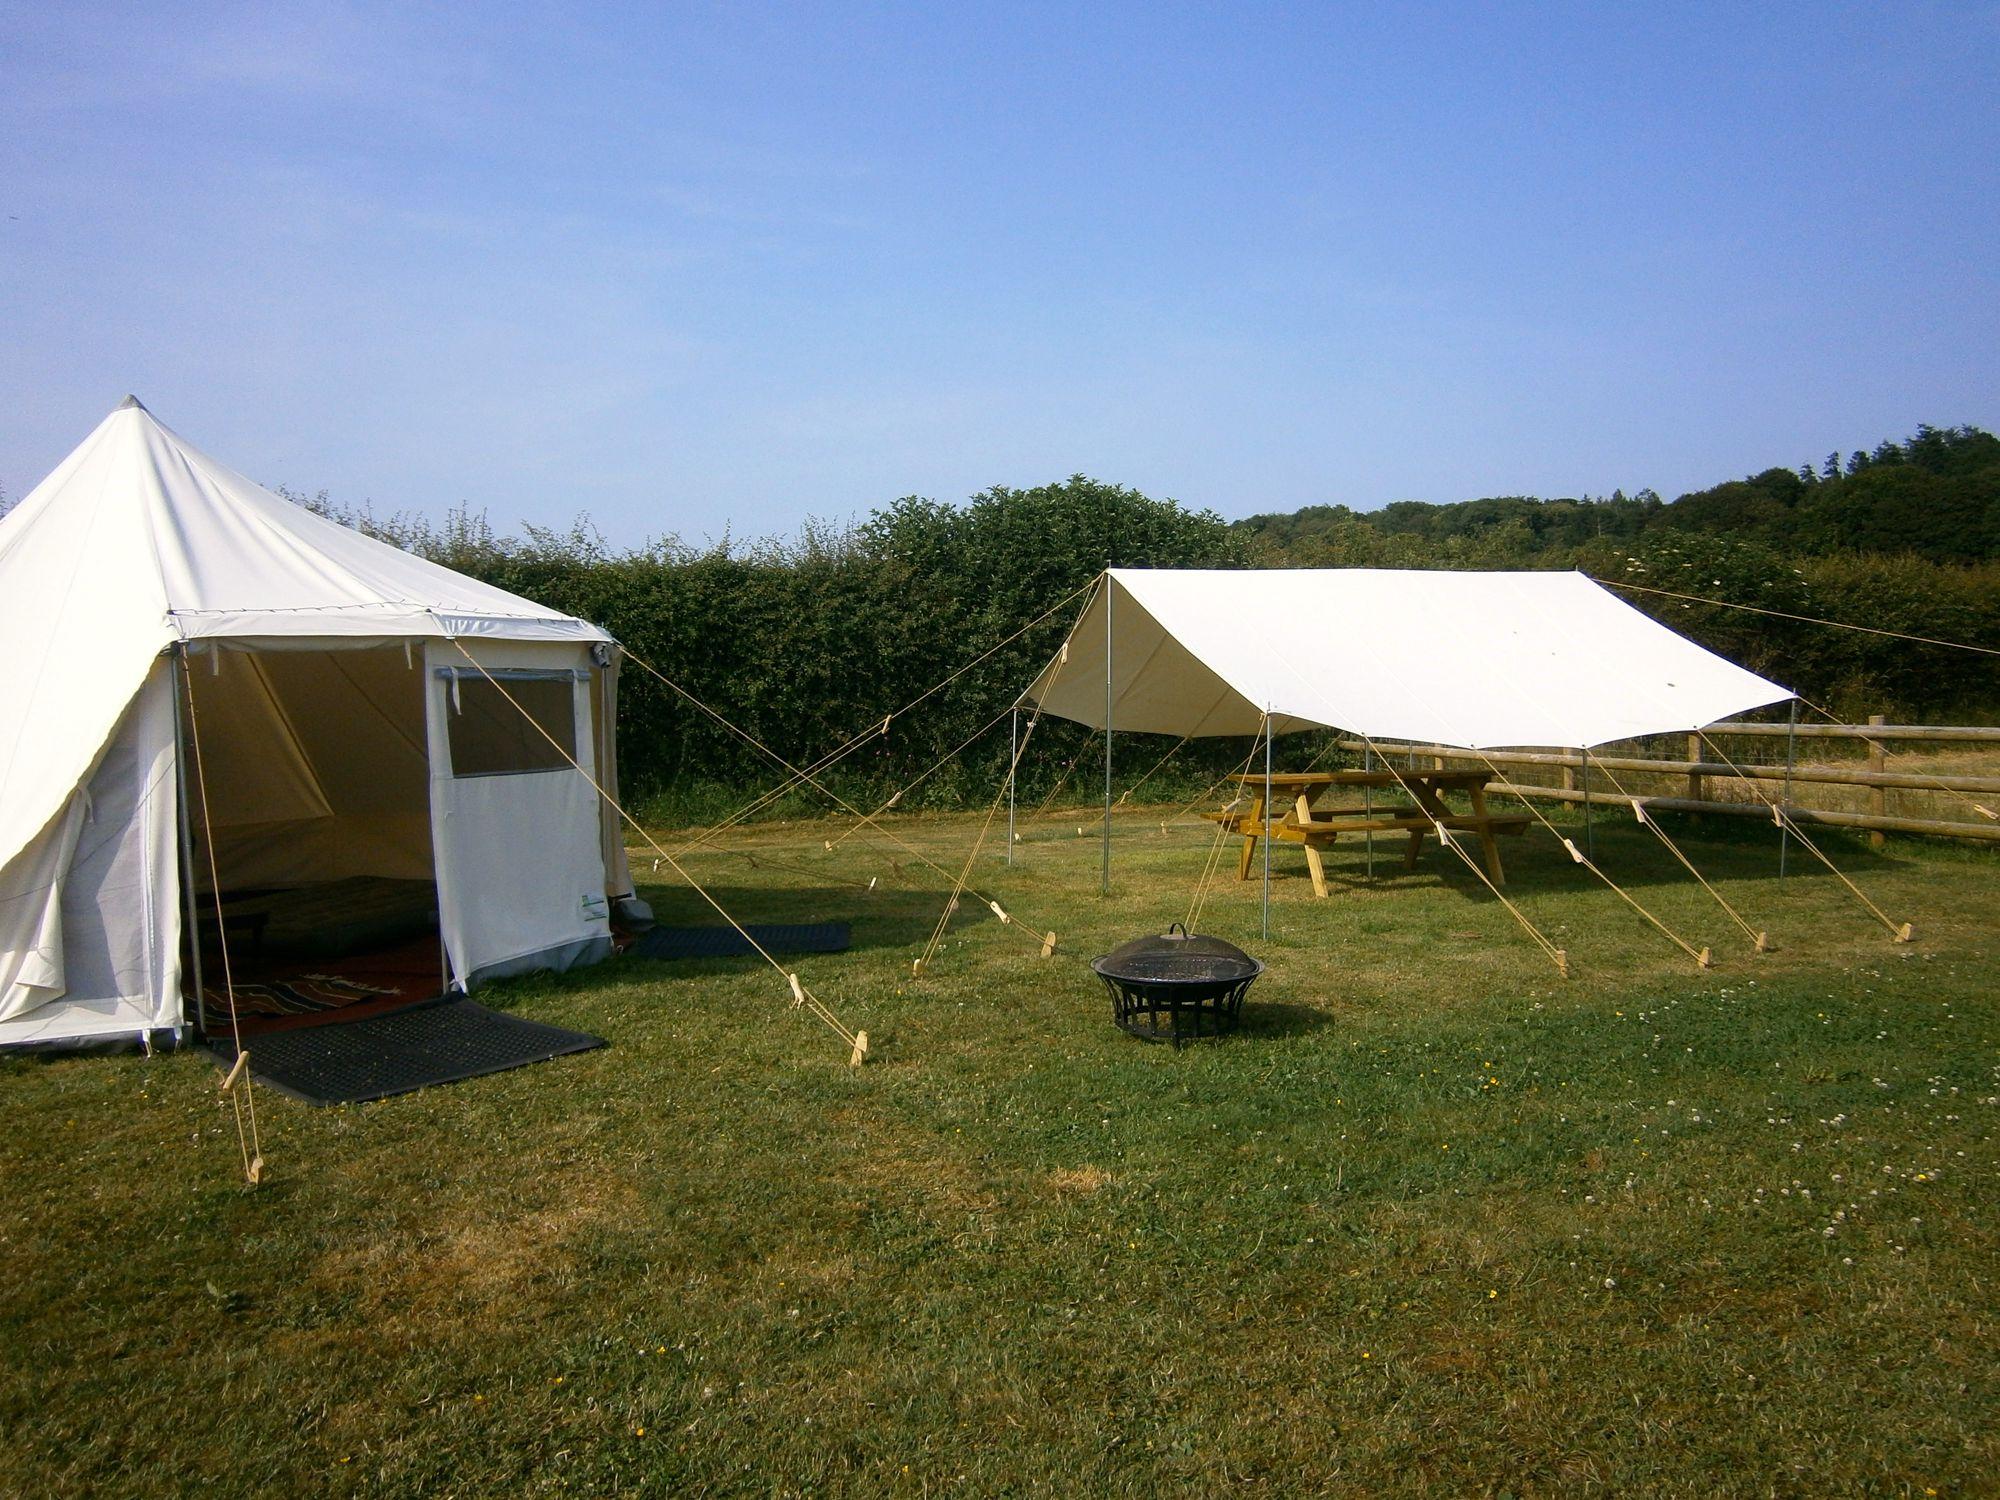 Campsites in Dorchester holidays at I Love This Campsite